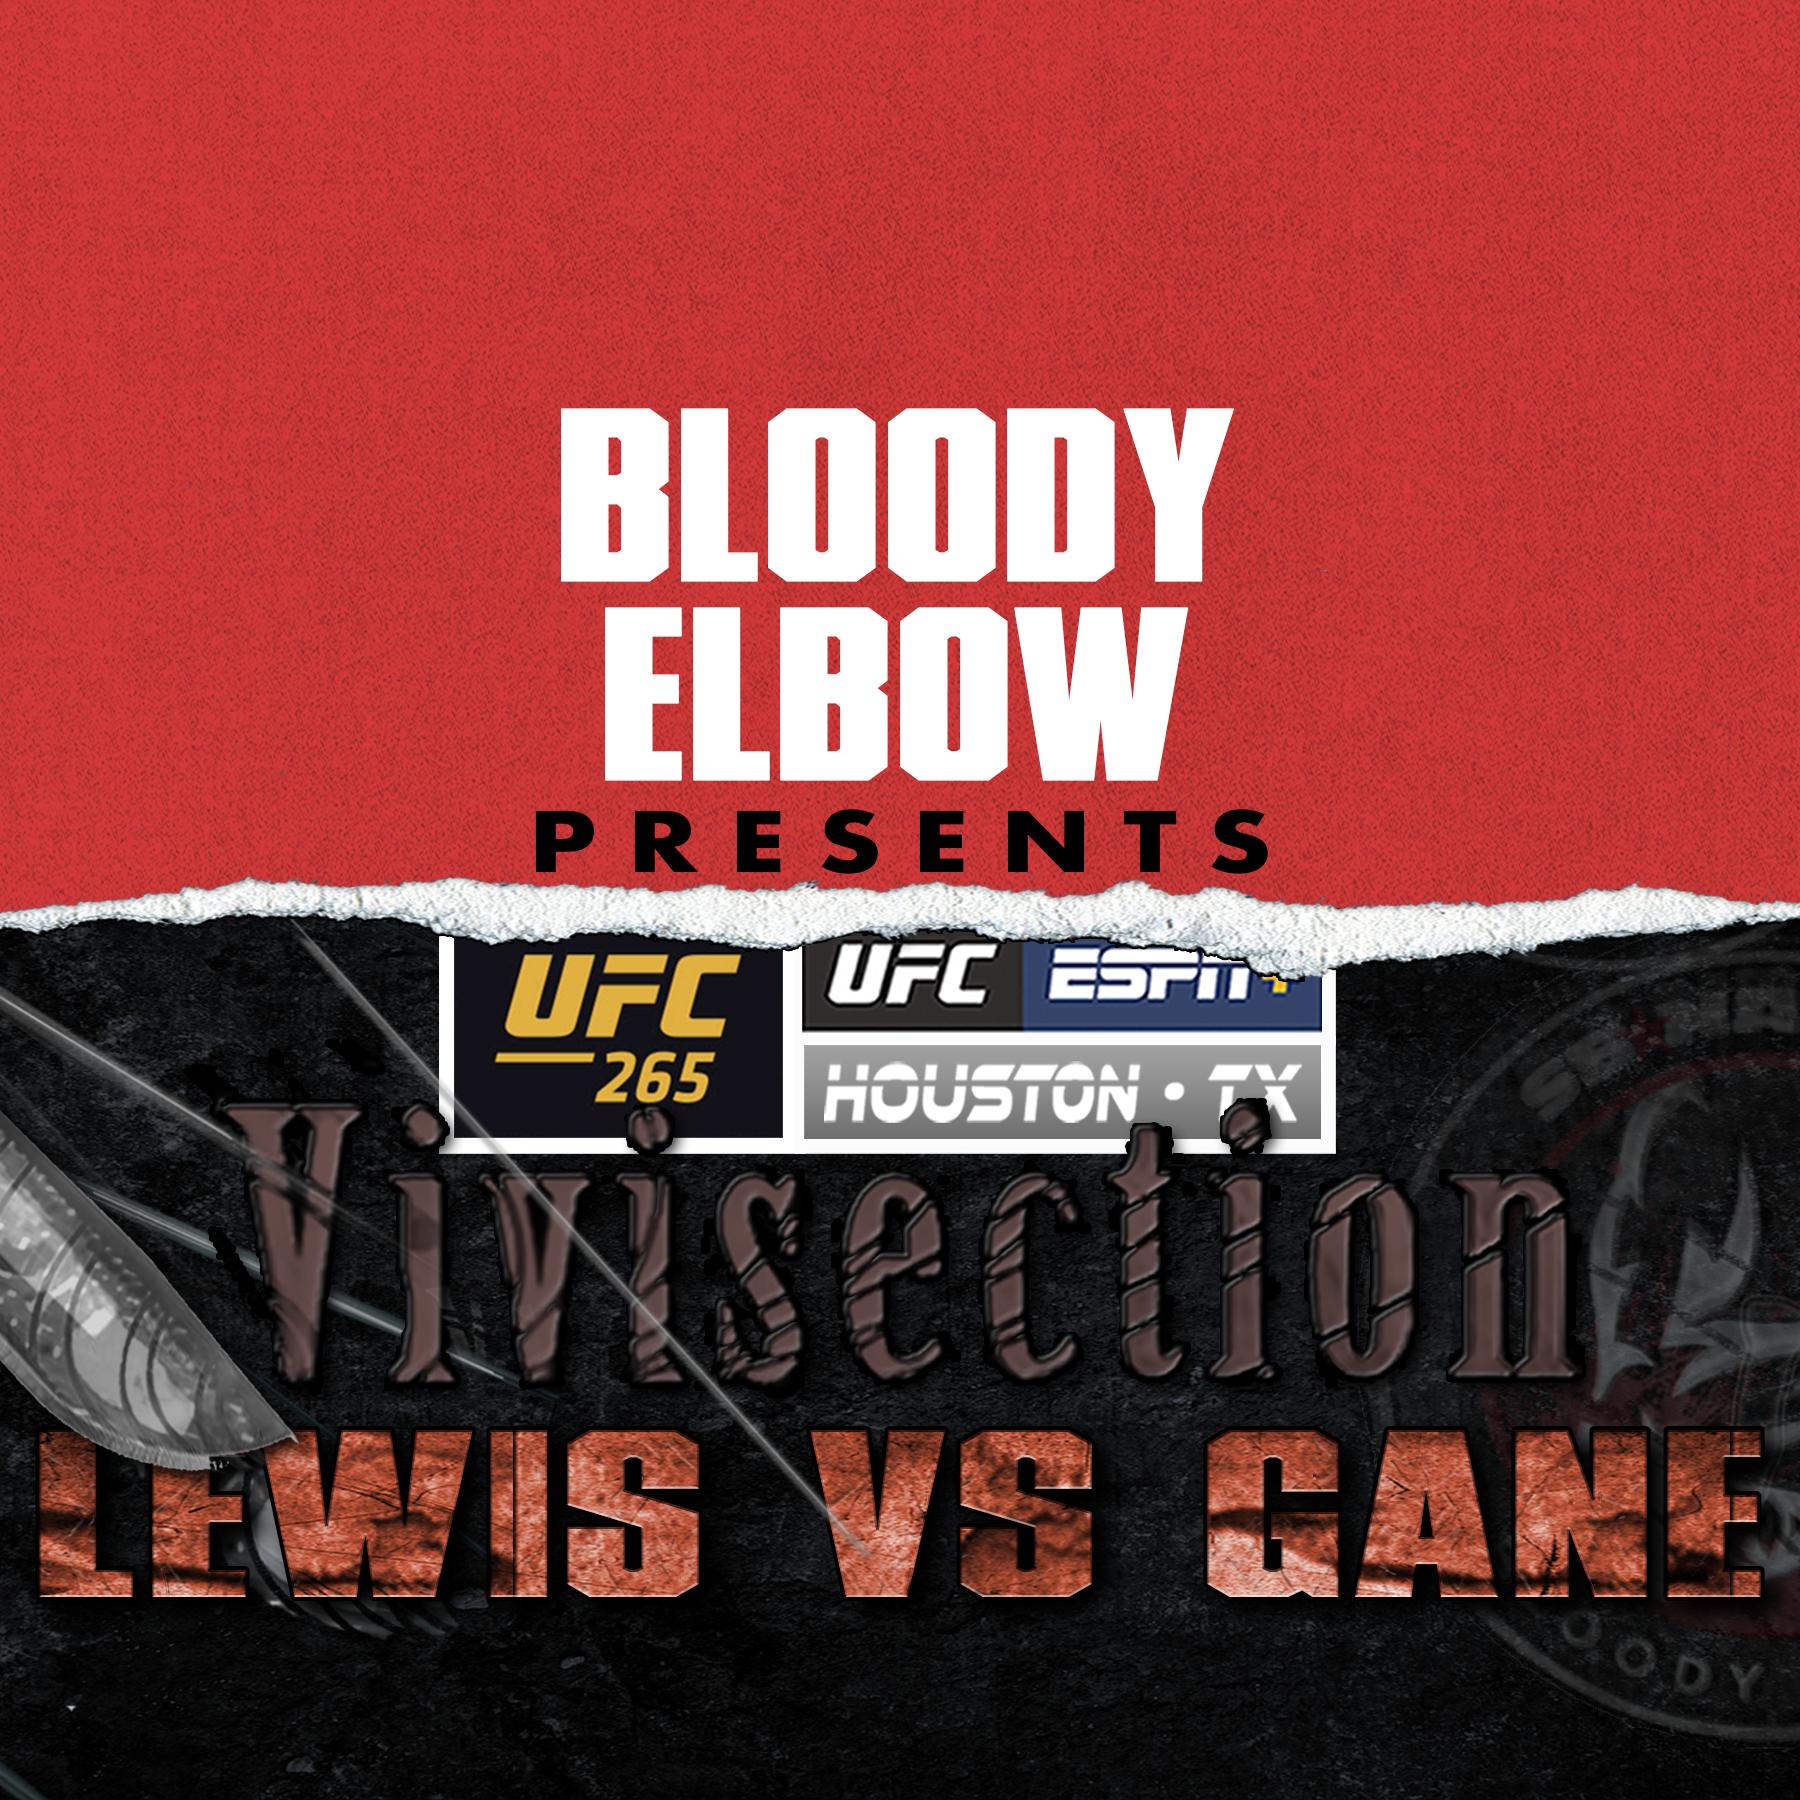 MMA VIVI, The MMA Vivisection, UFC Podcast, UFC 265, UFC Picks, UFC Odds, UFC Analysis, Derrick Lewis vs Ciryl Gane Preview,